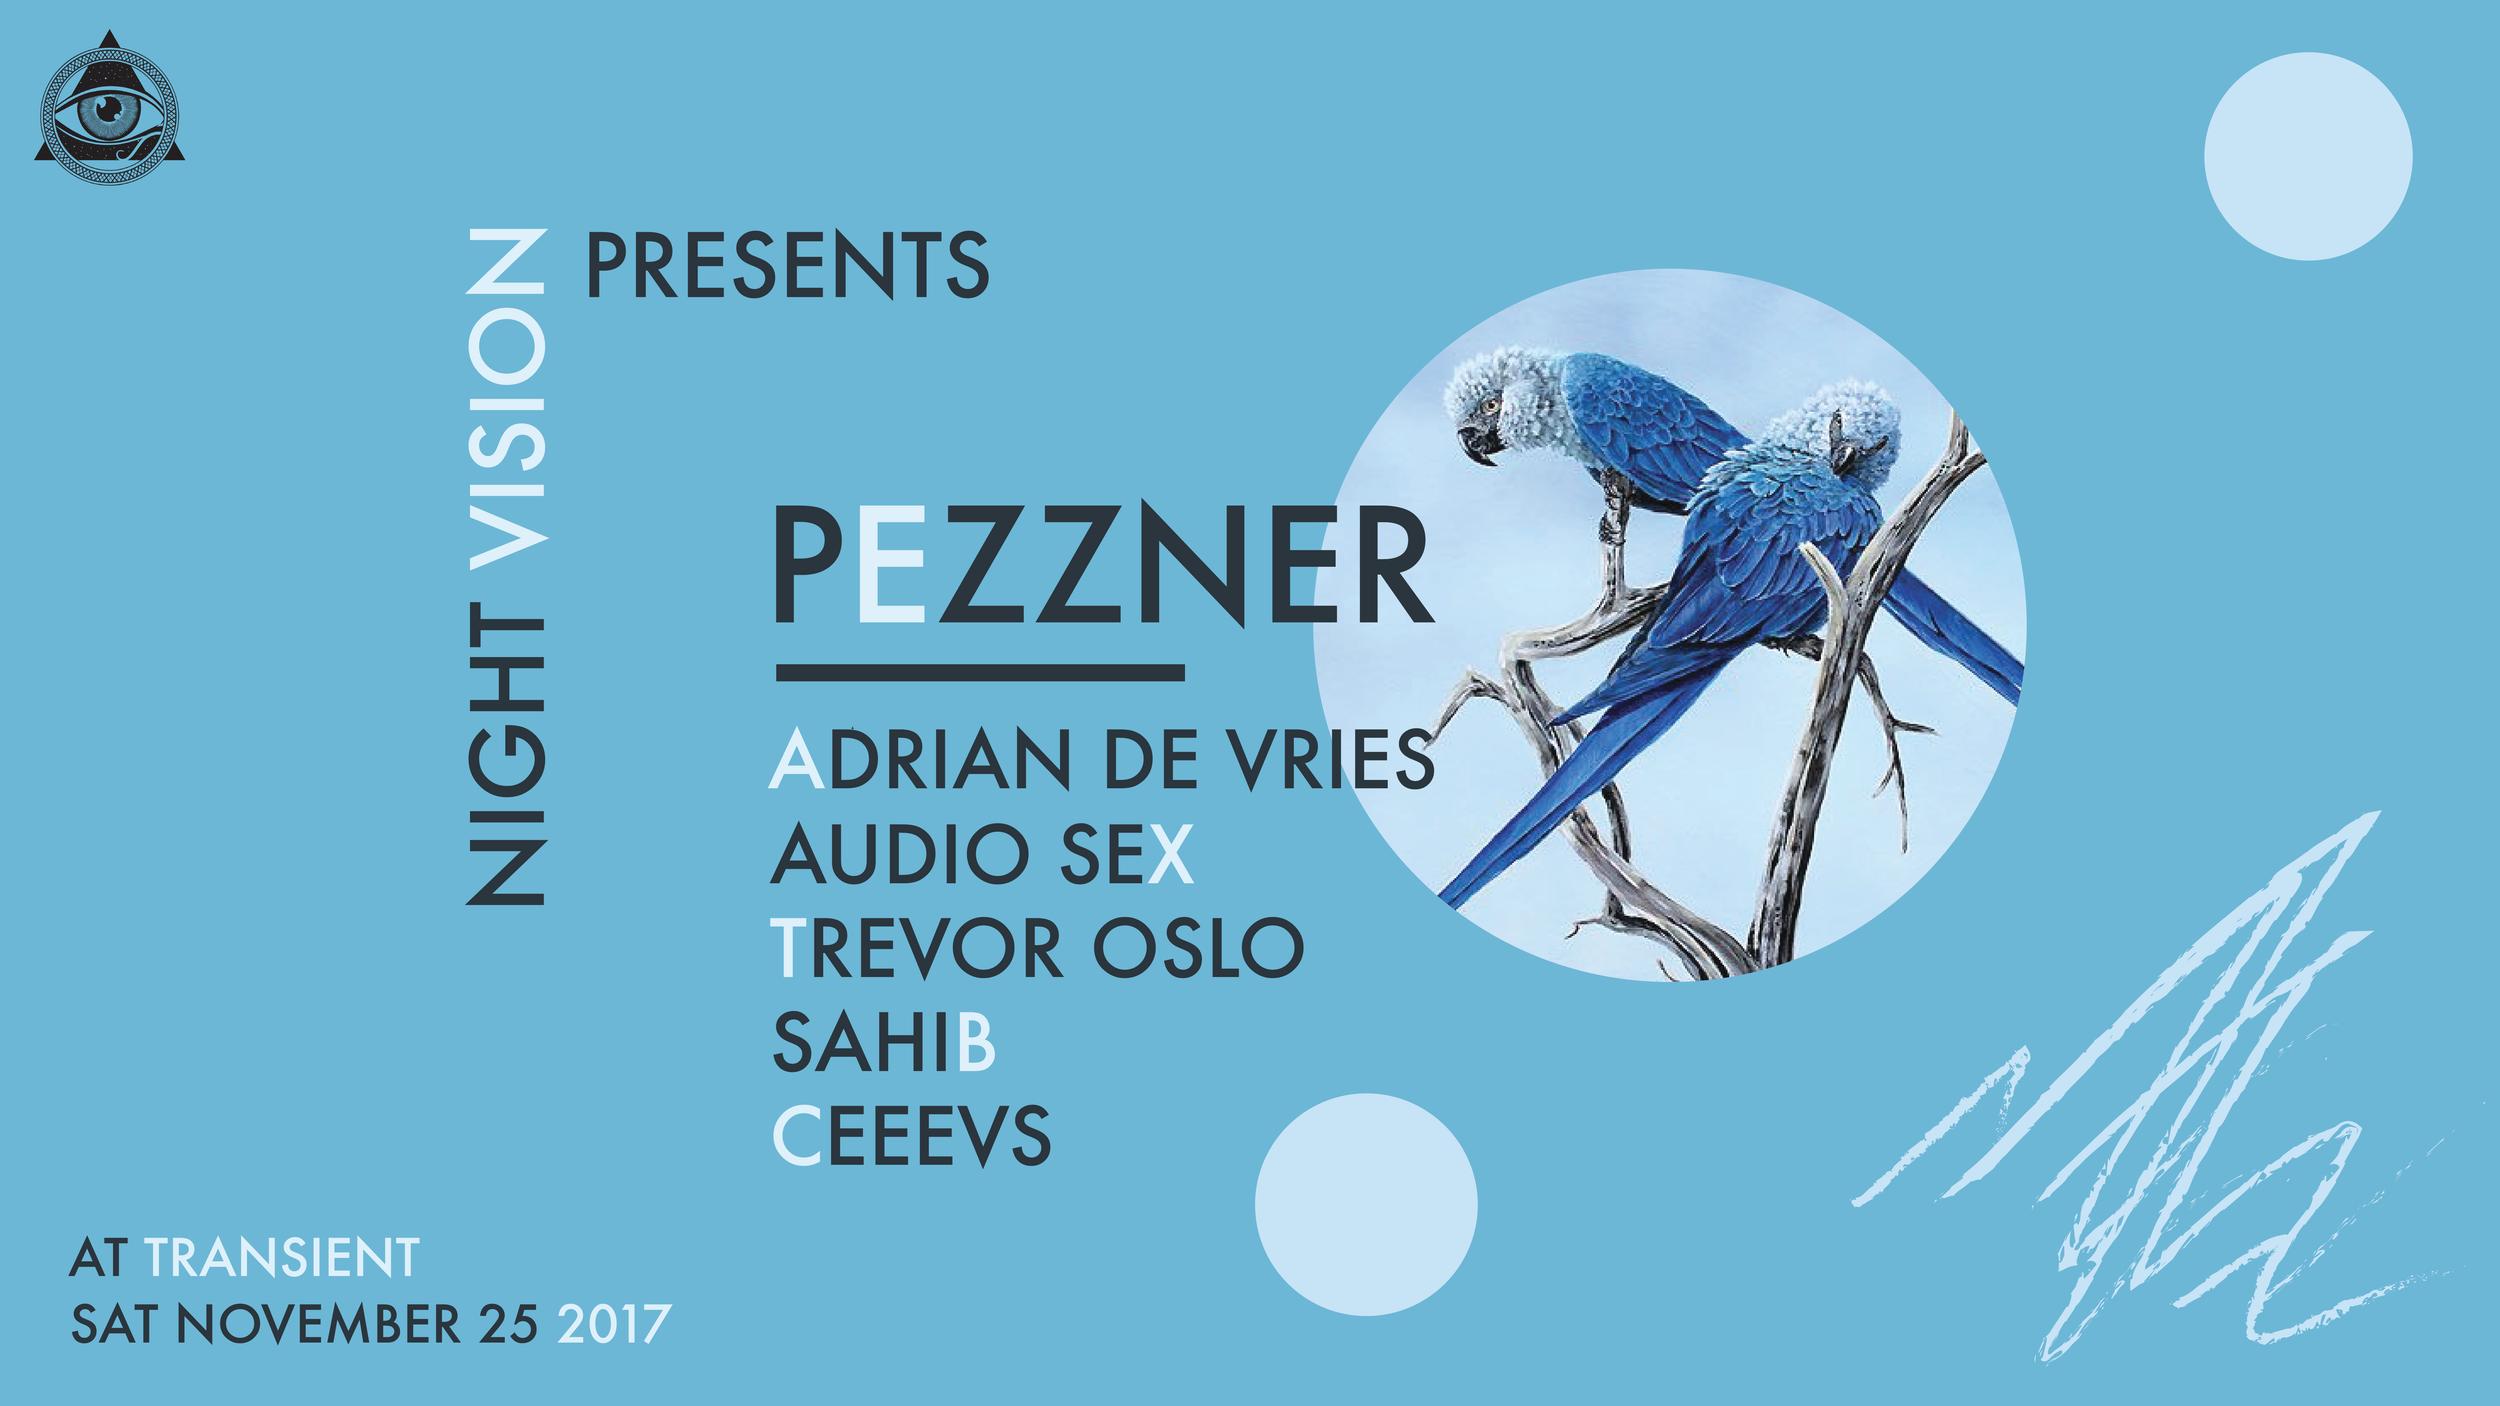 Pezzner in Edmonton